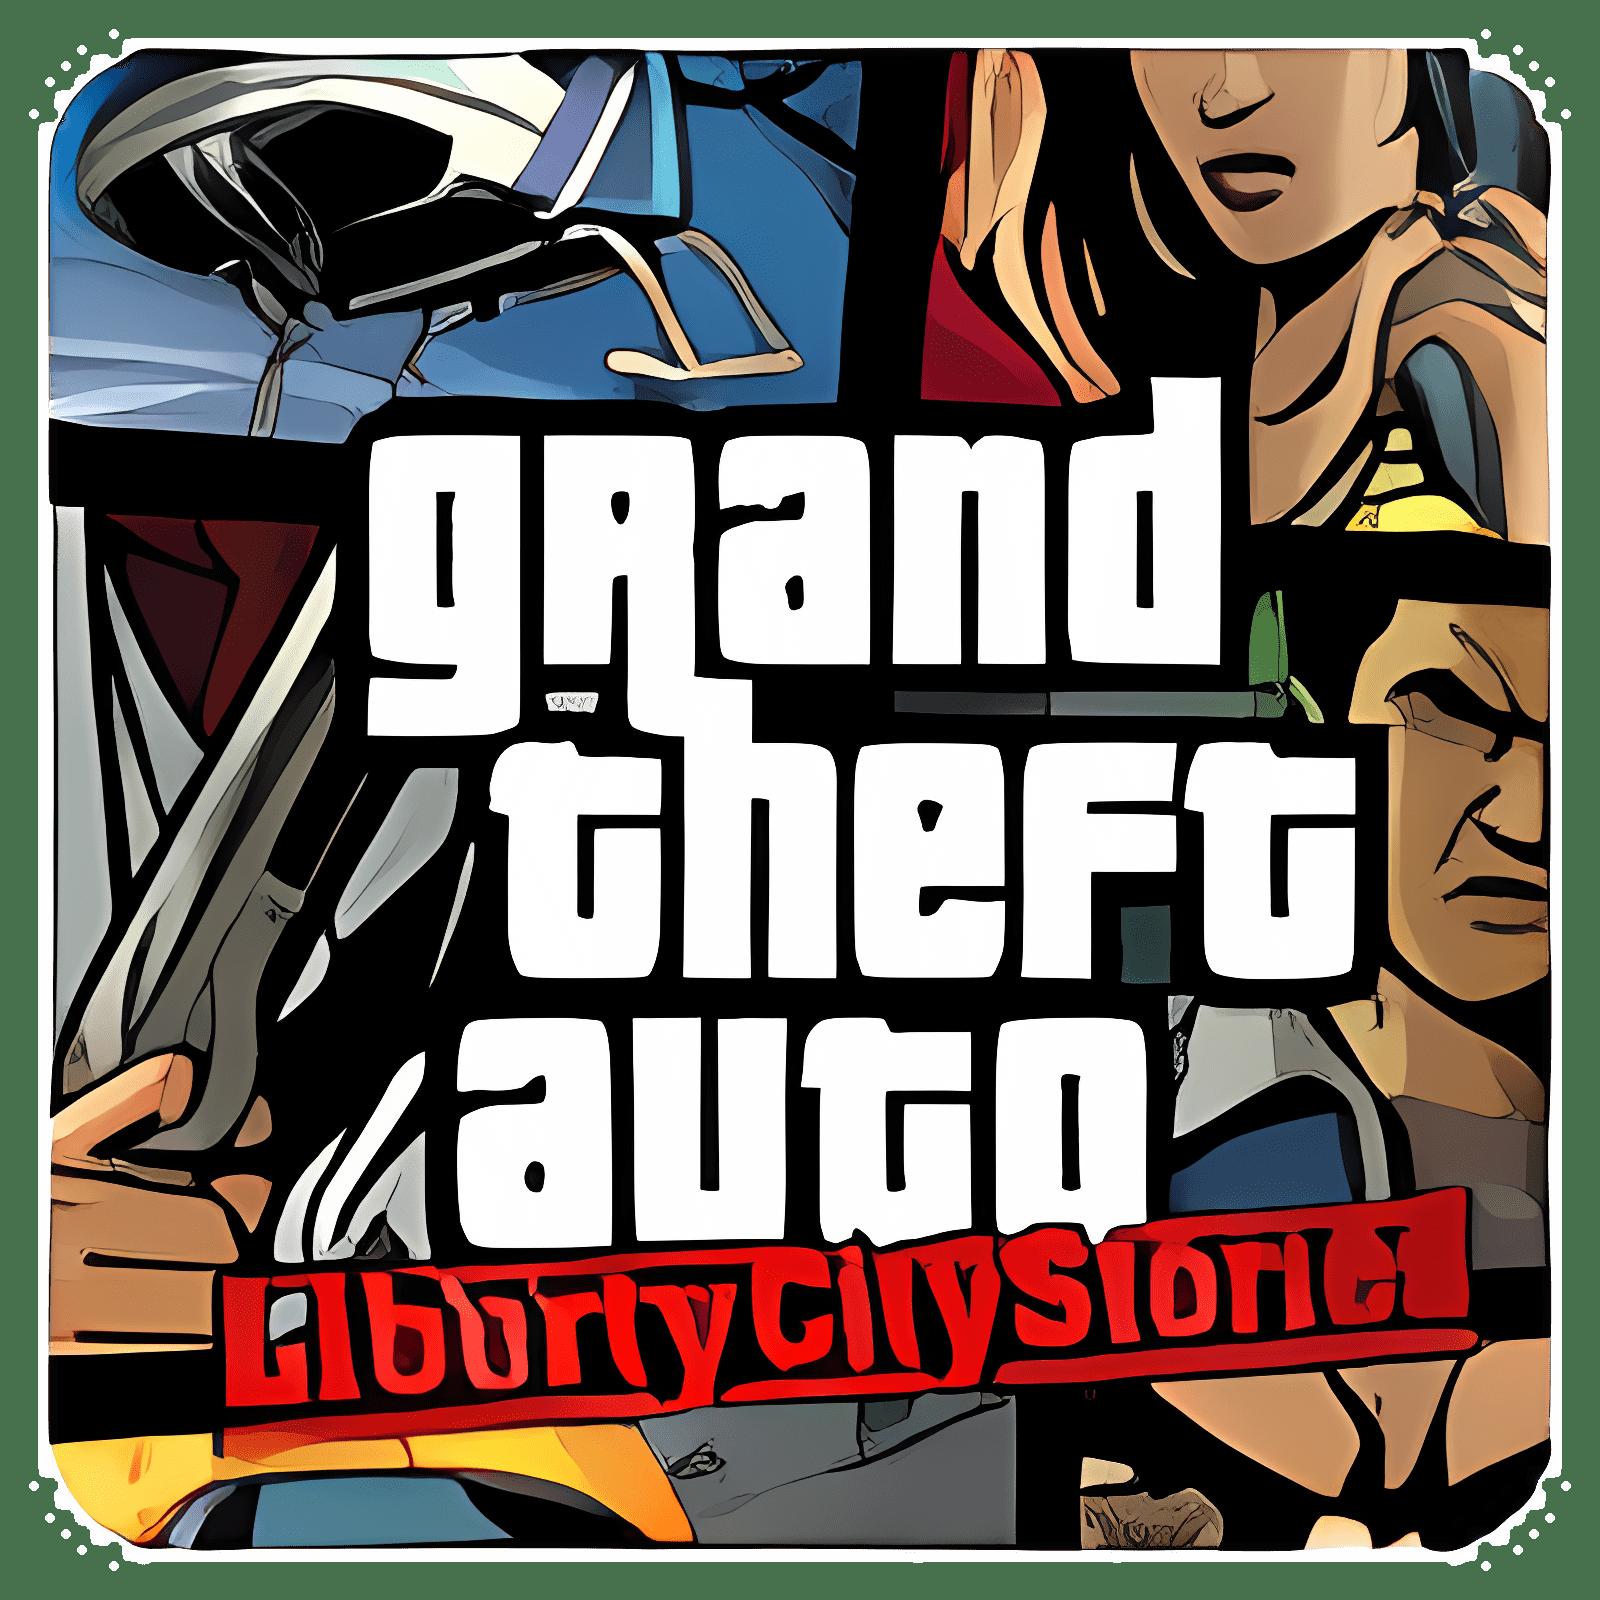 Fond d'écran GTA Liberty City Stories